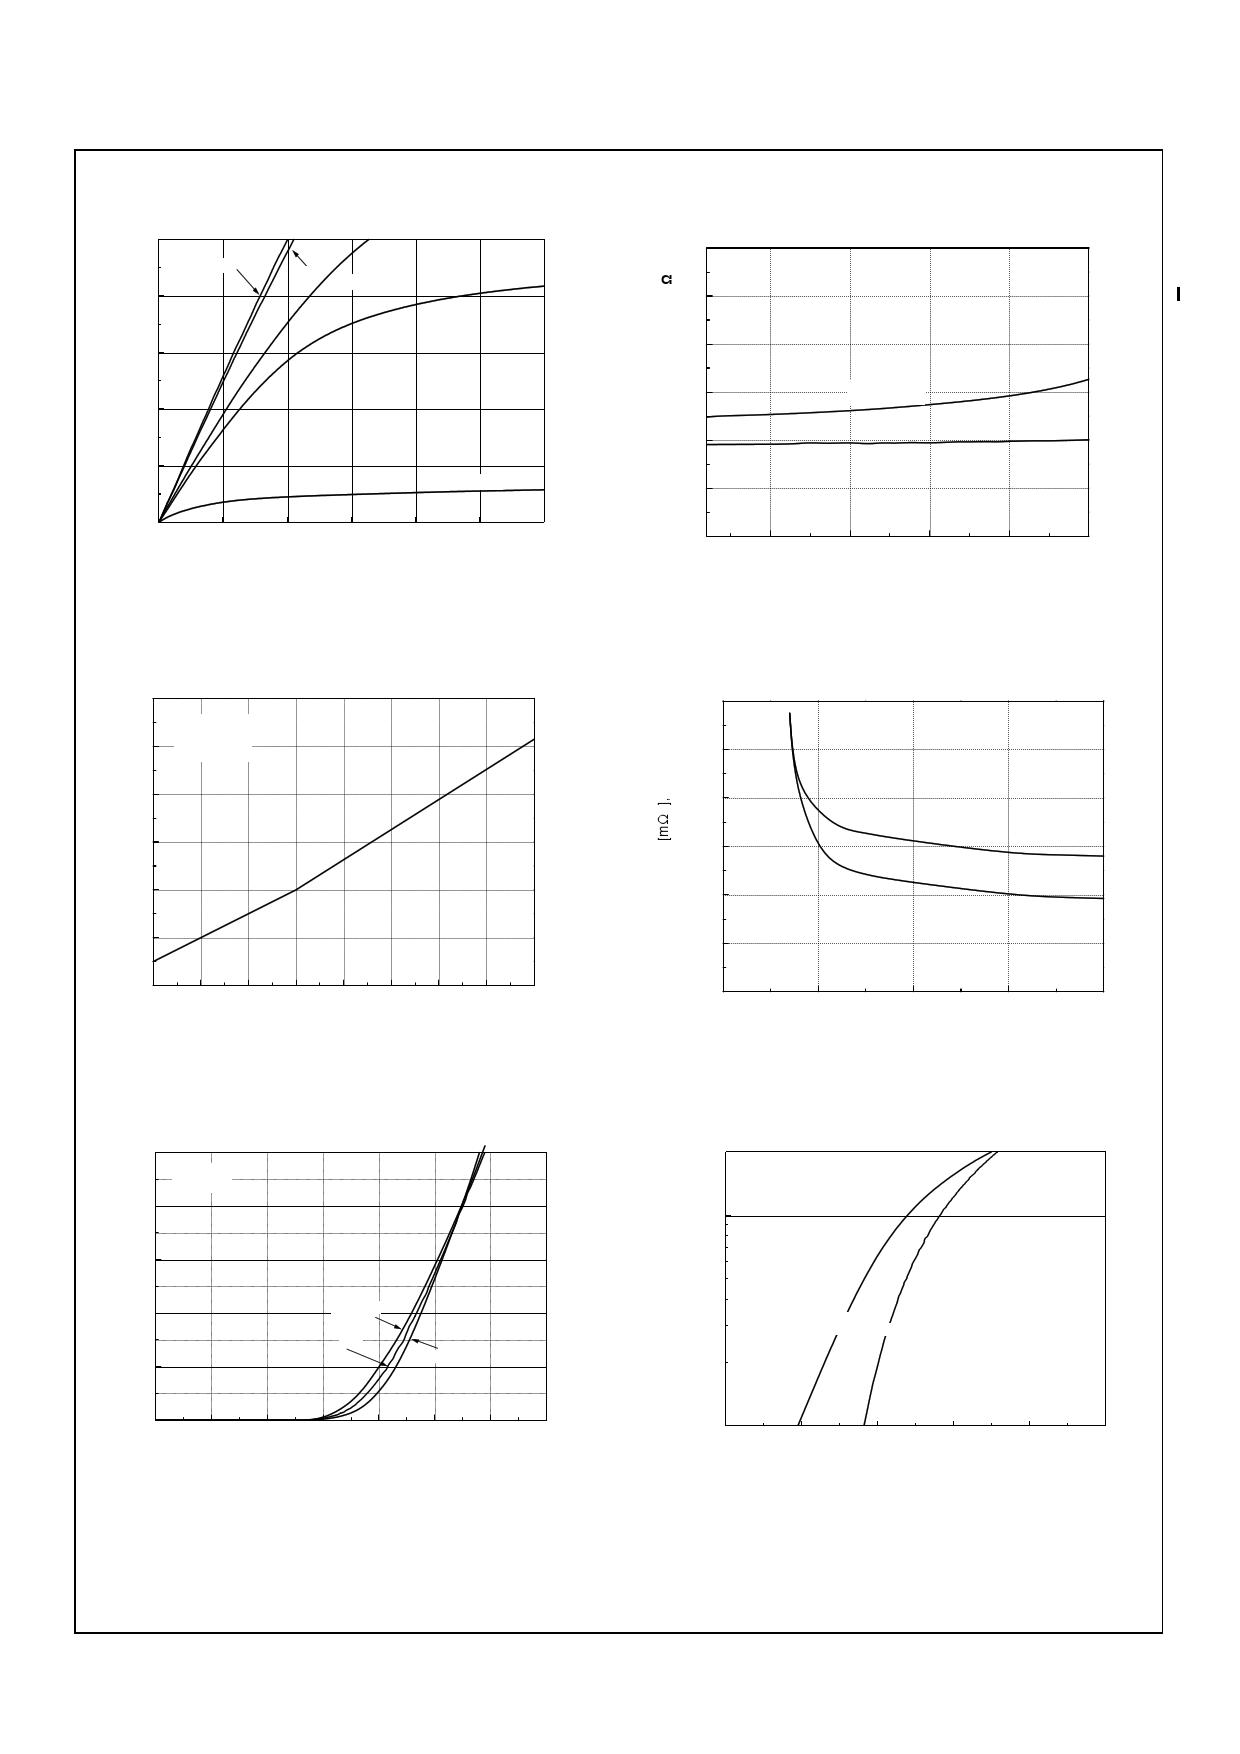 MDS3754A pdf, ピン配列